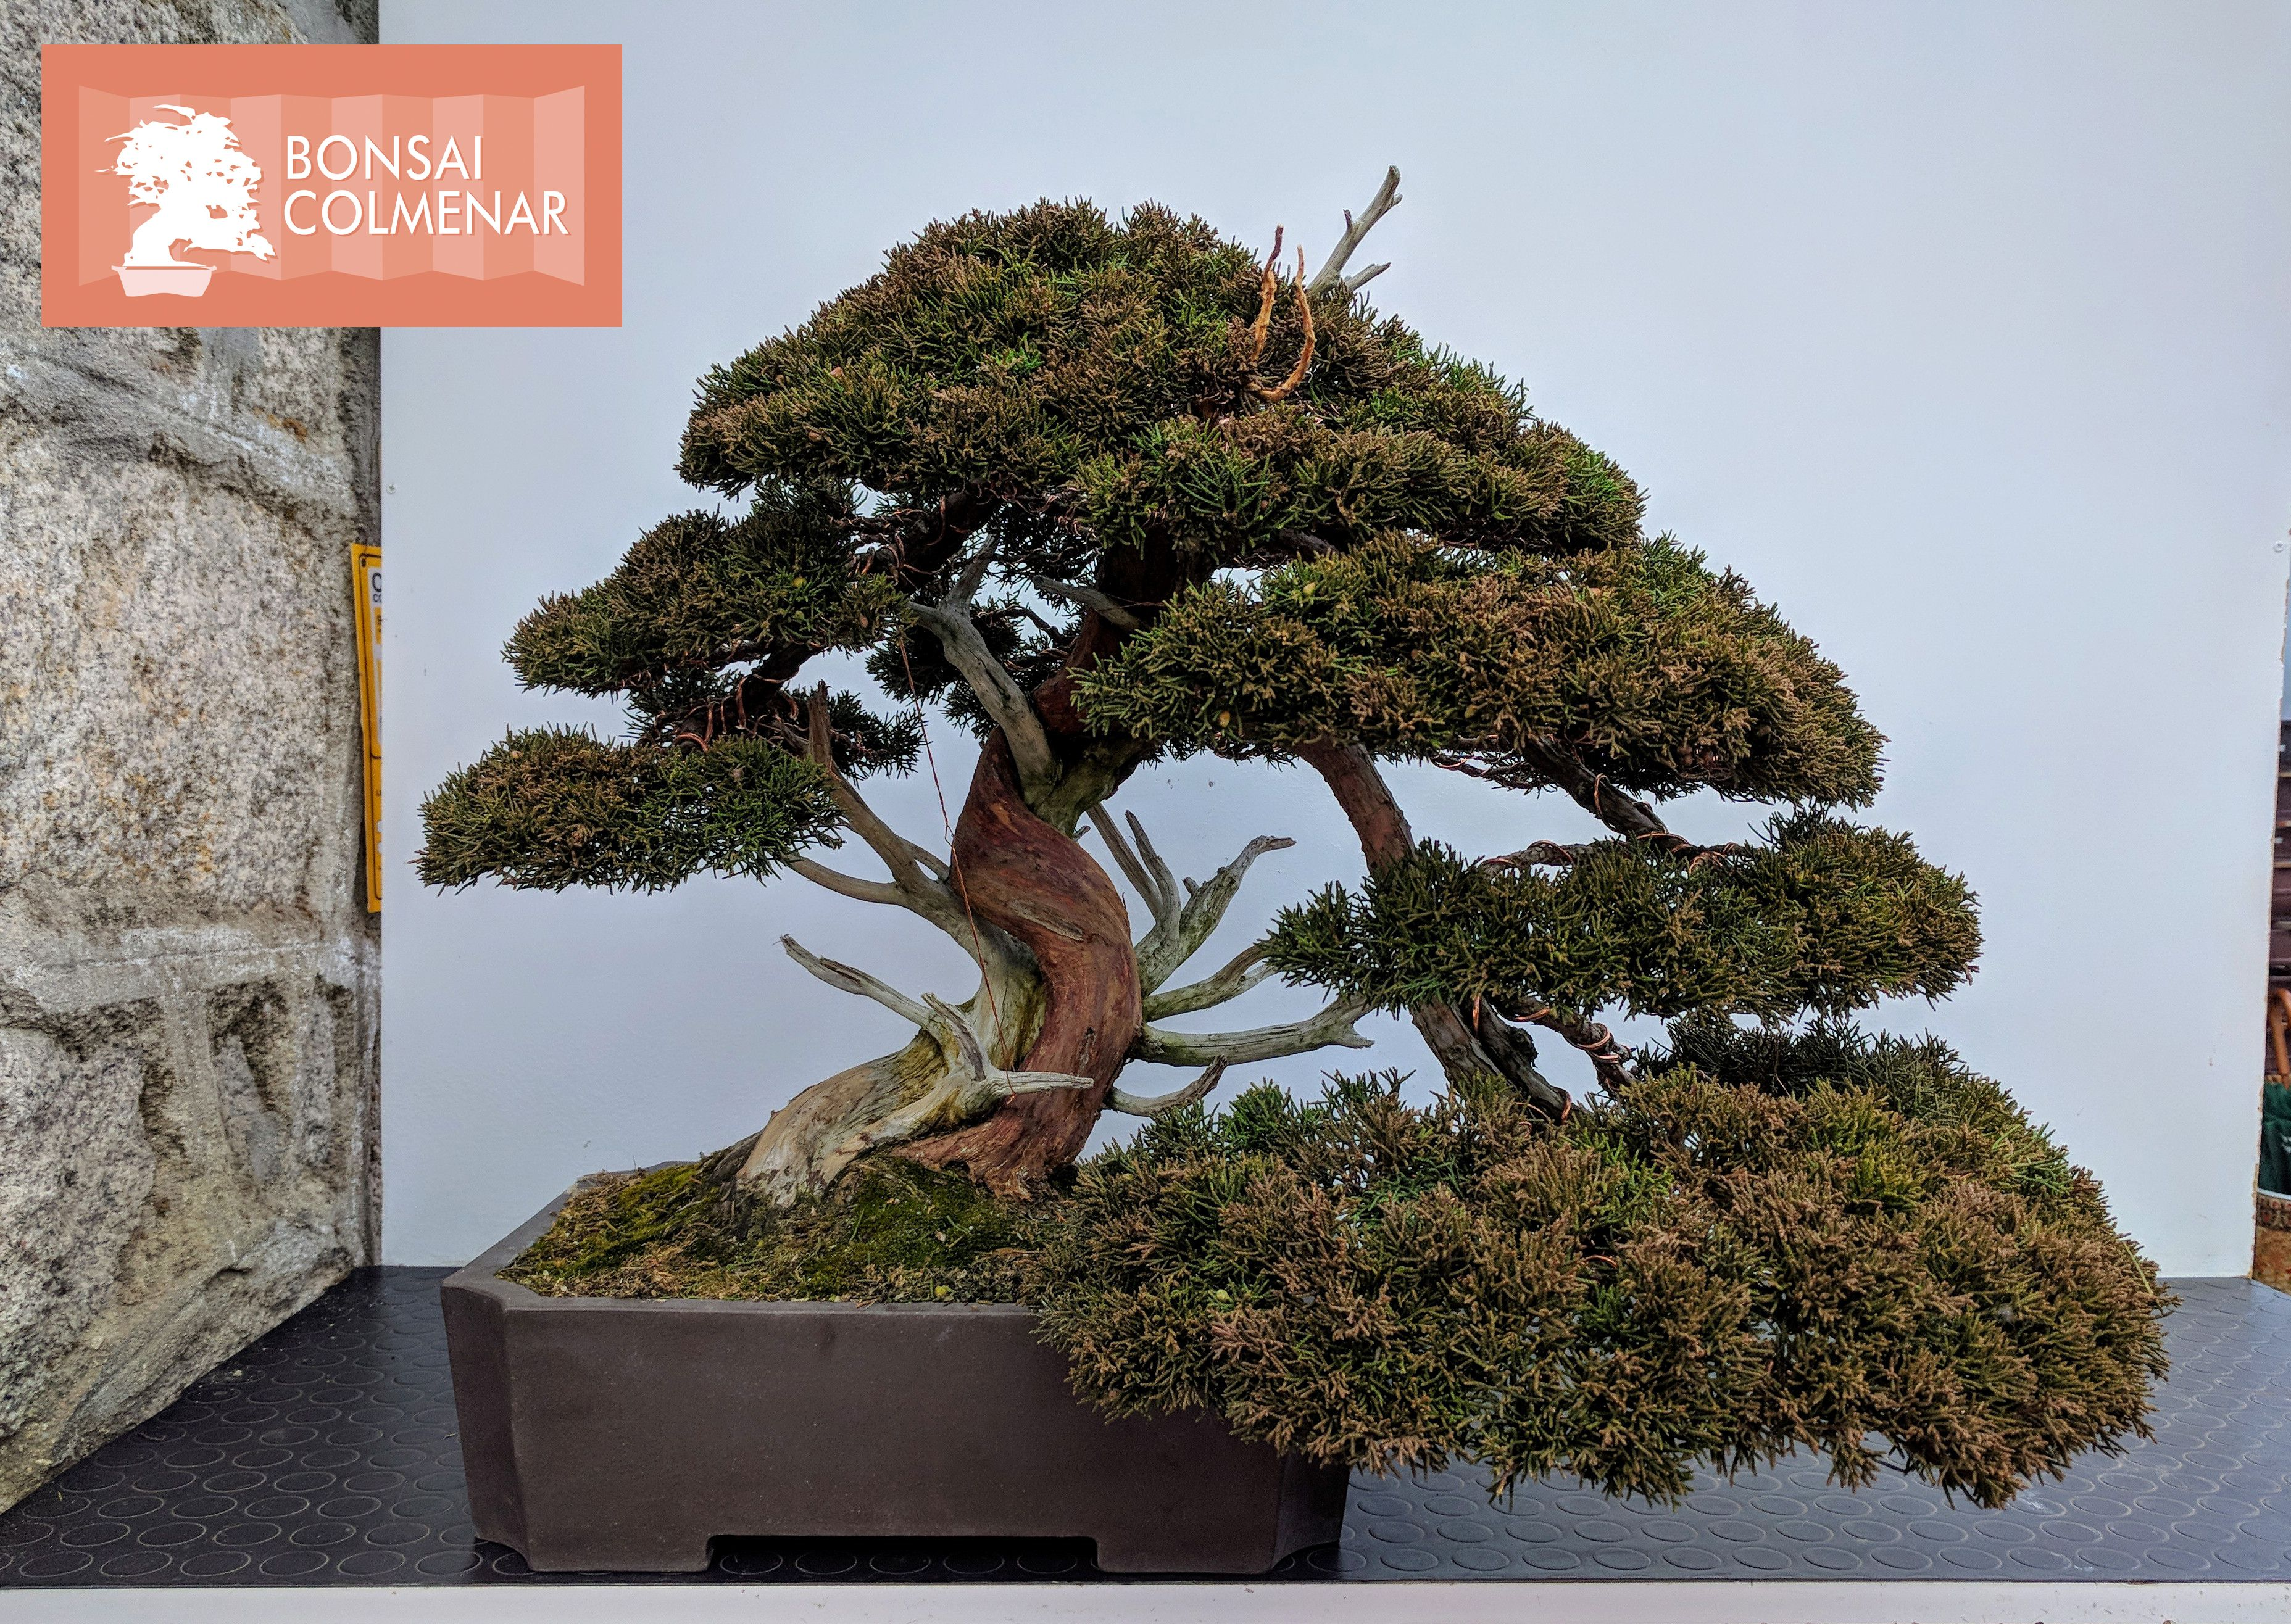 Juníperus Chinensis Bonsai Colmenar Tienda Y Escuela De Bonsai Bonsai Diseños De árbol Bonsais